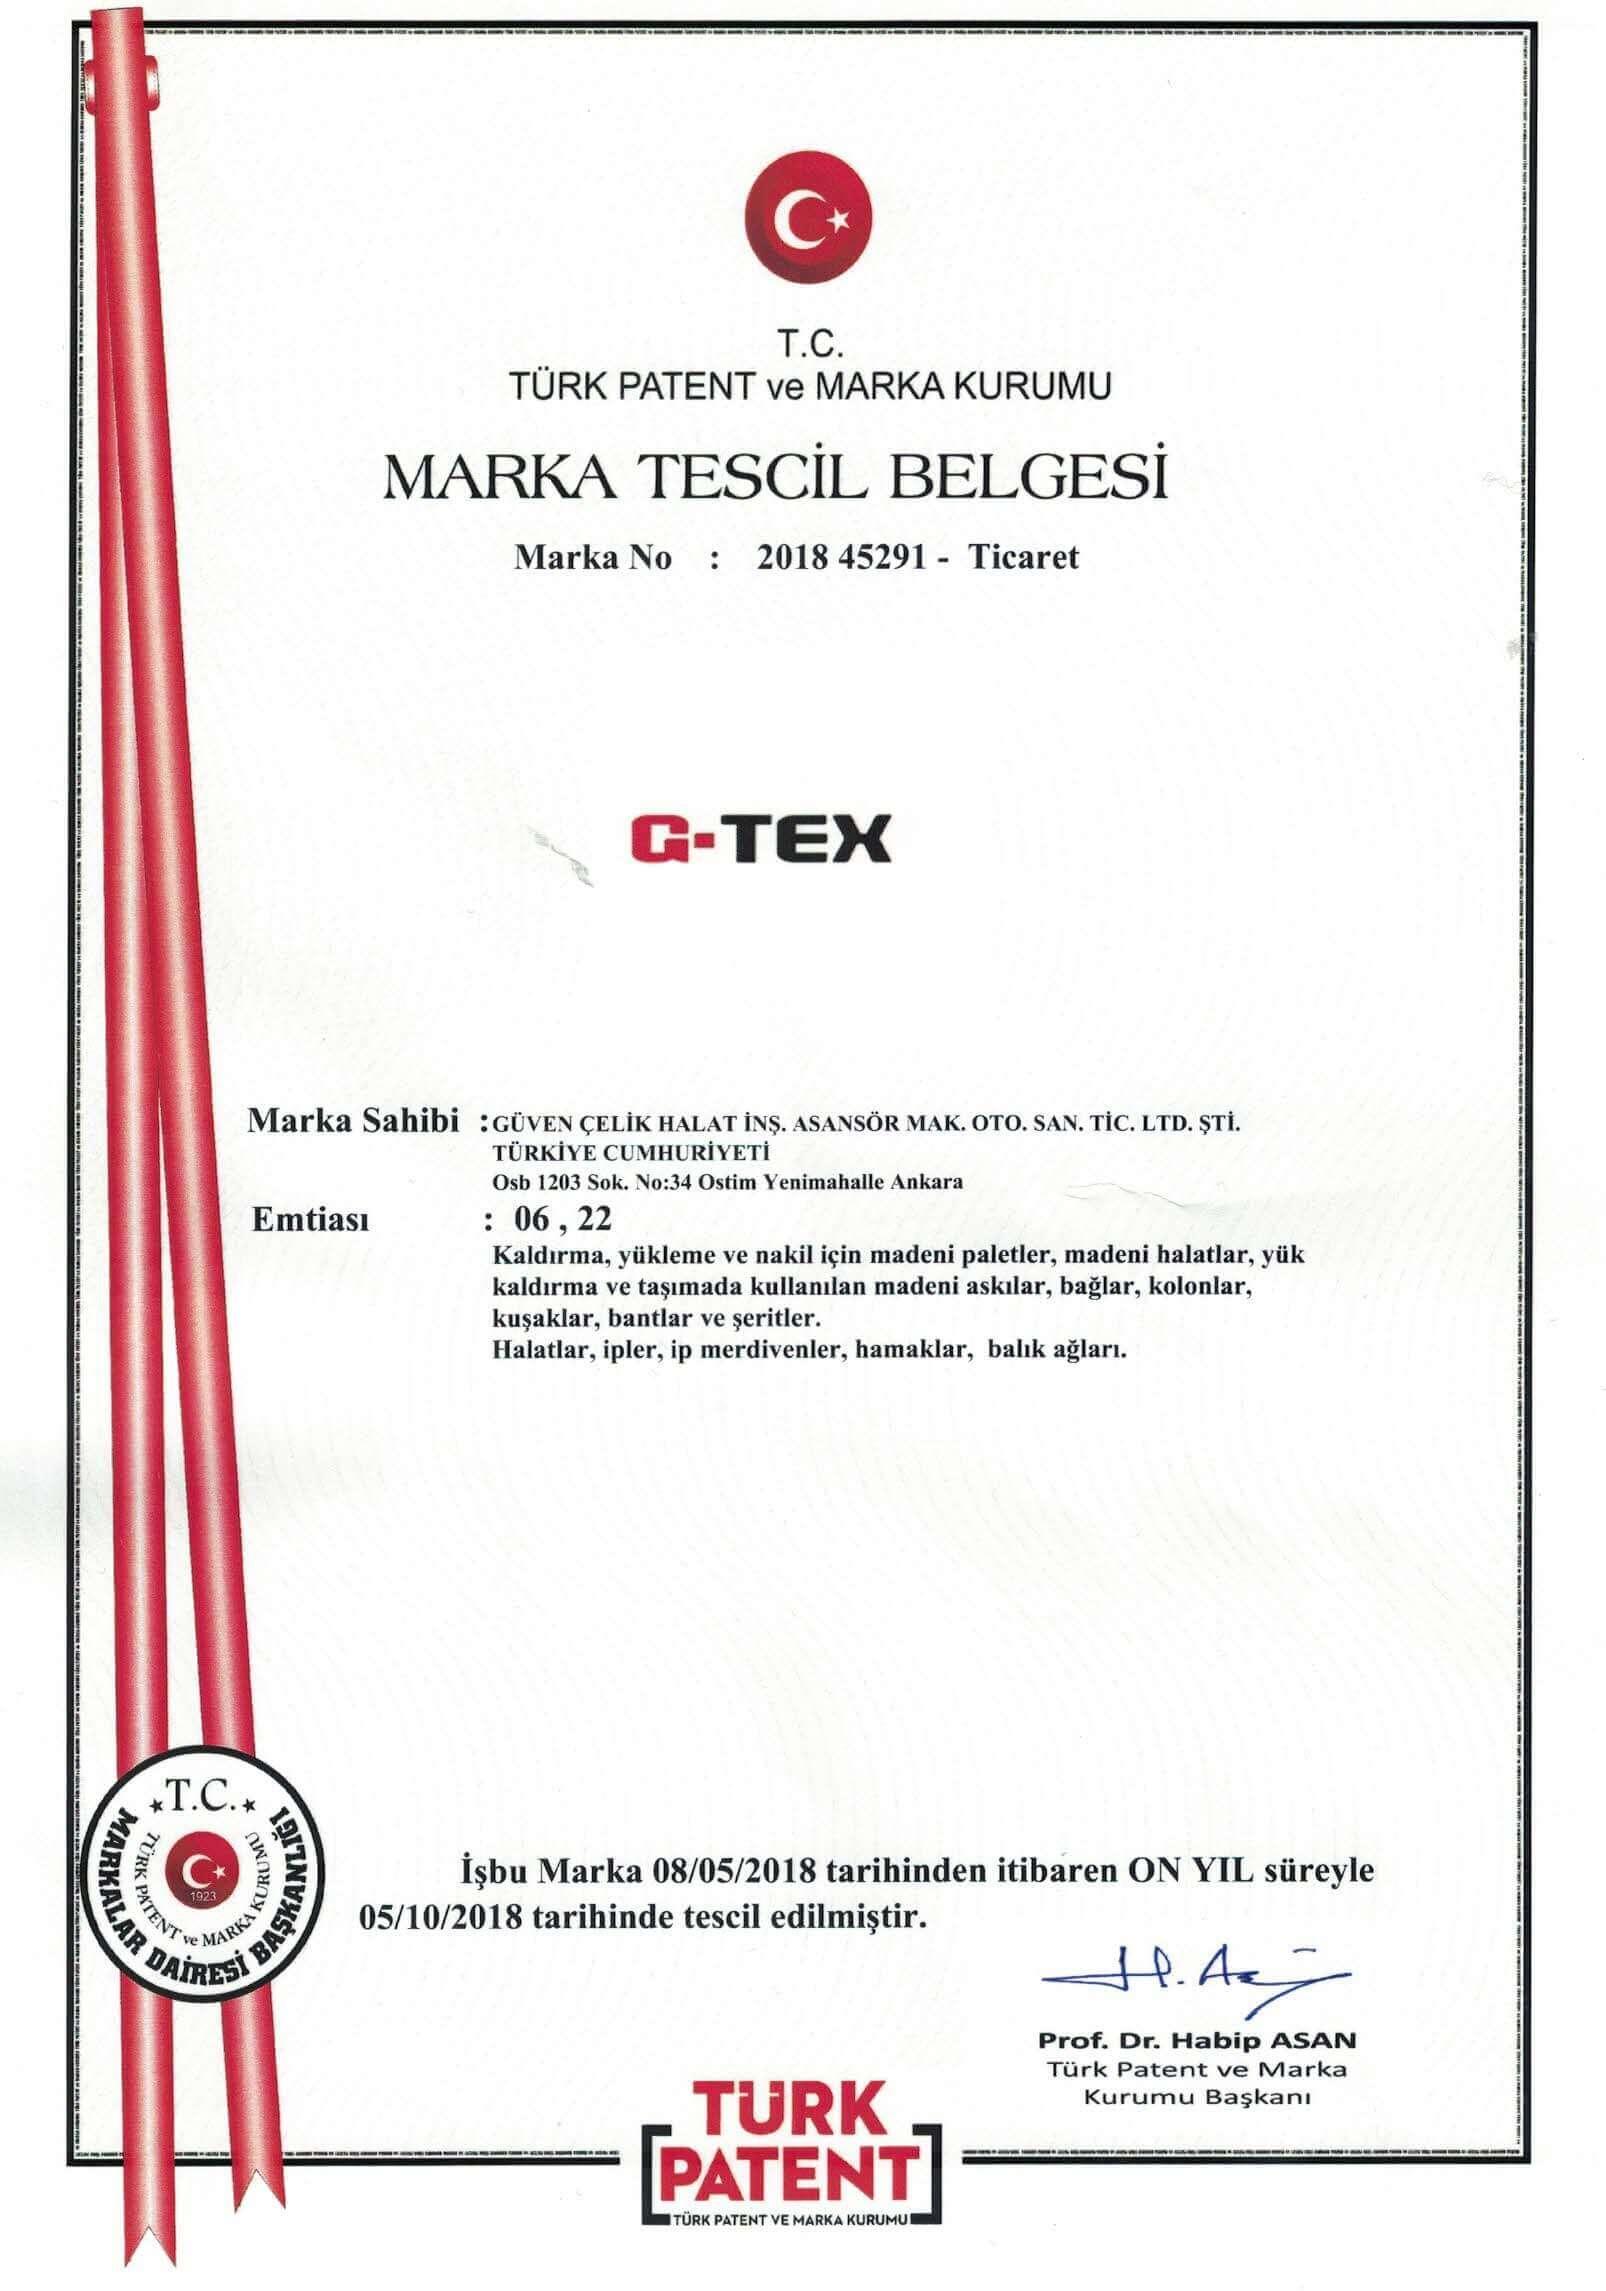 Marka Tescil Belgesi 2